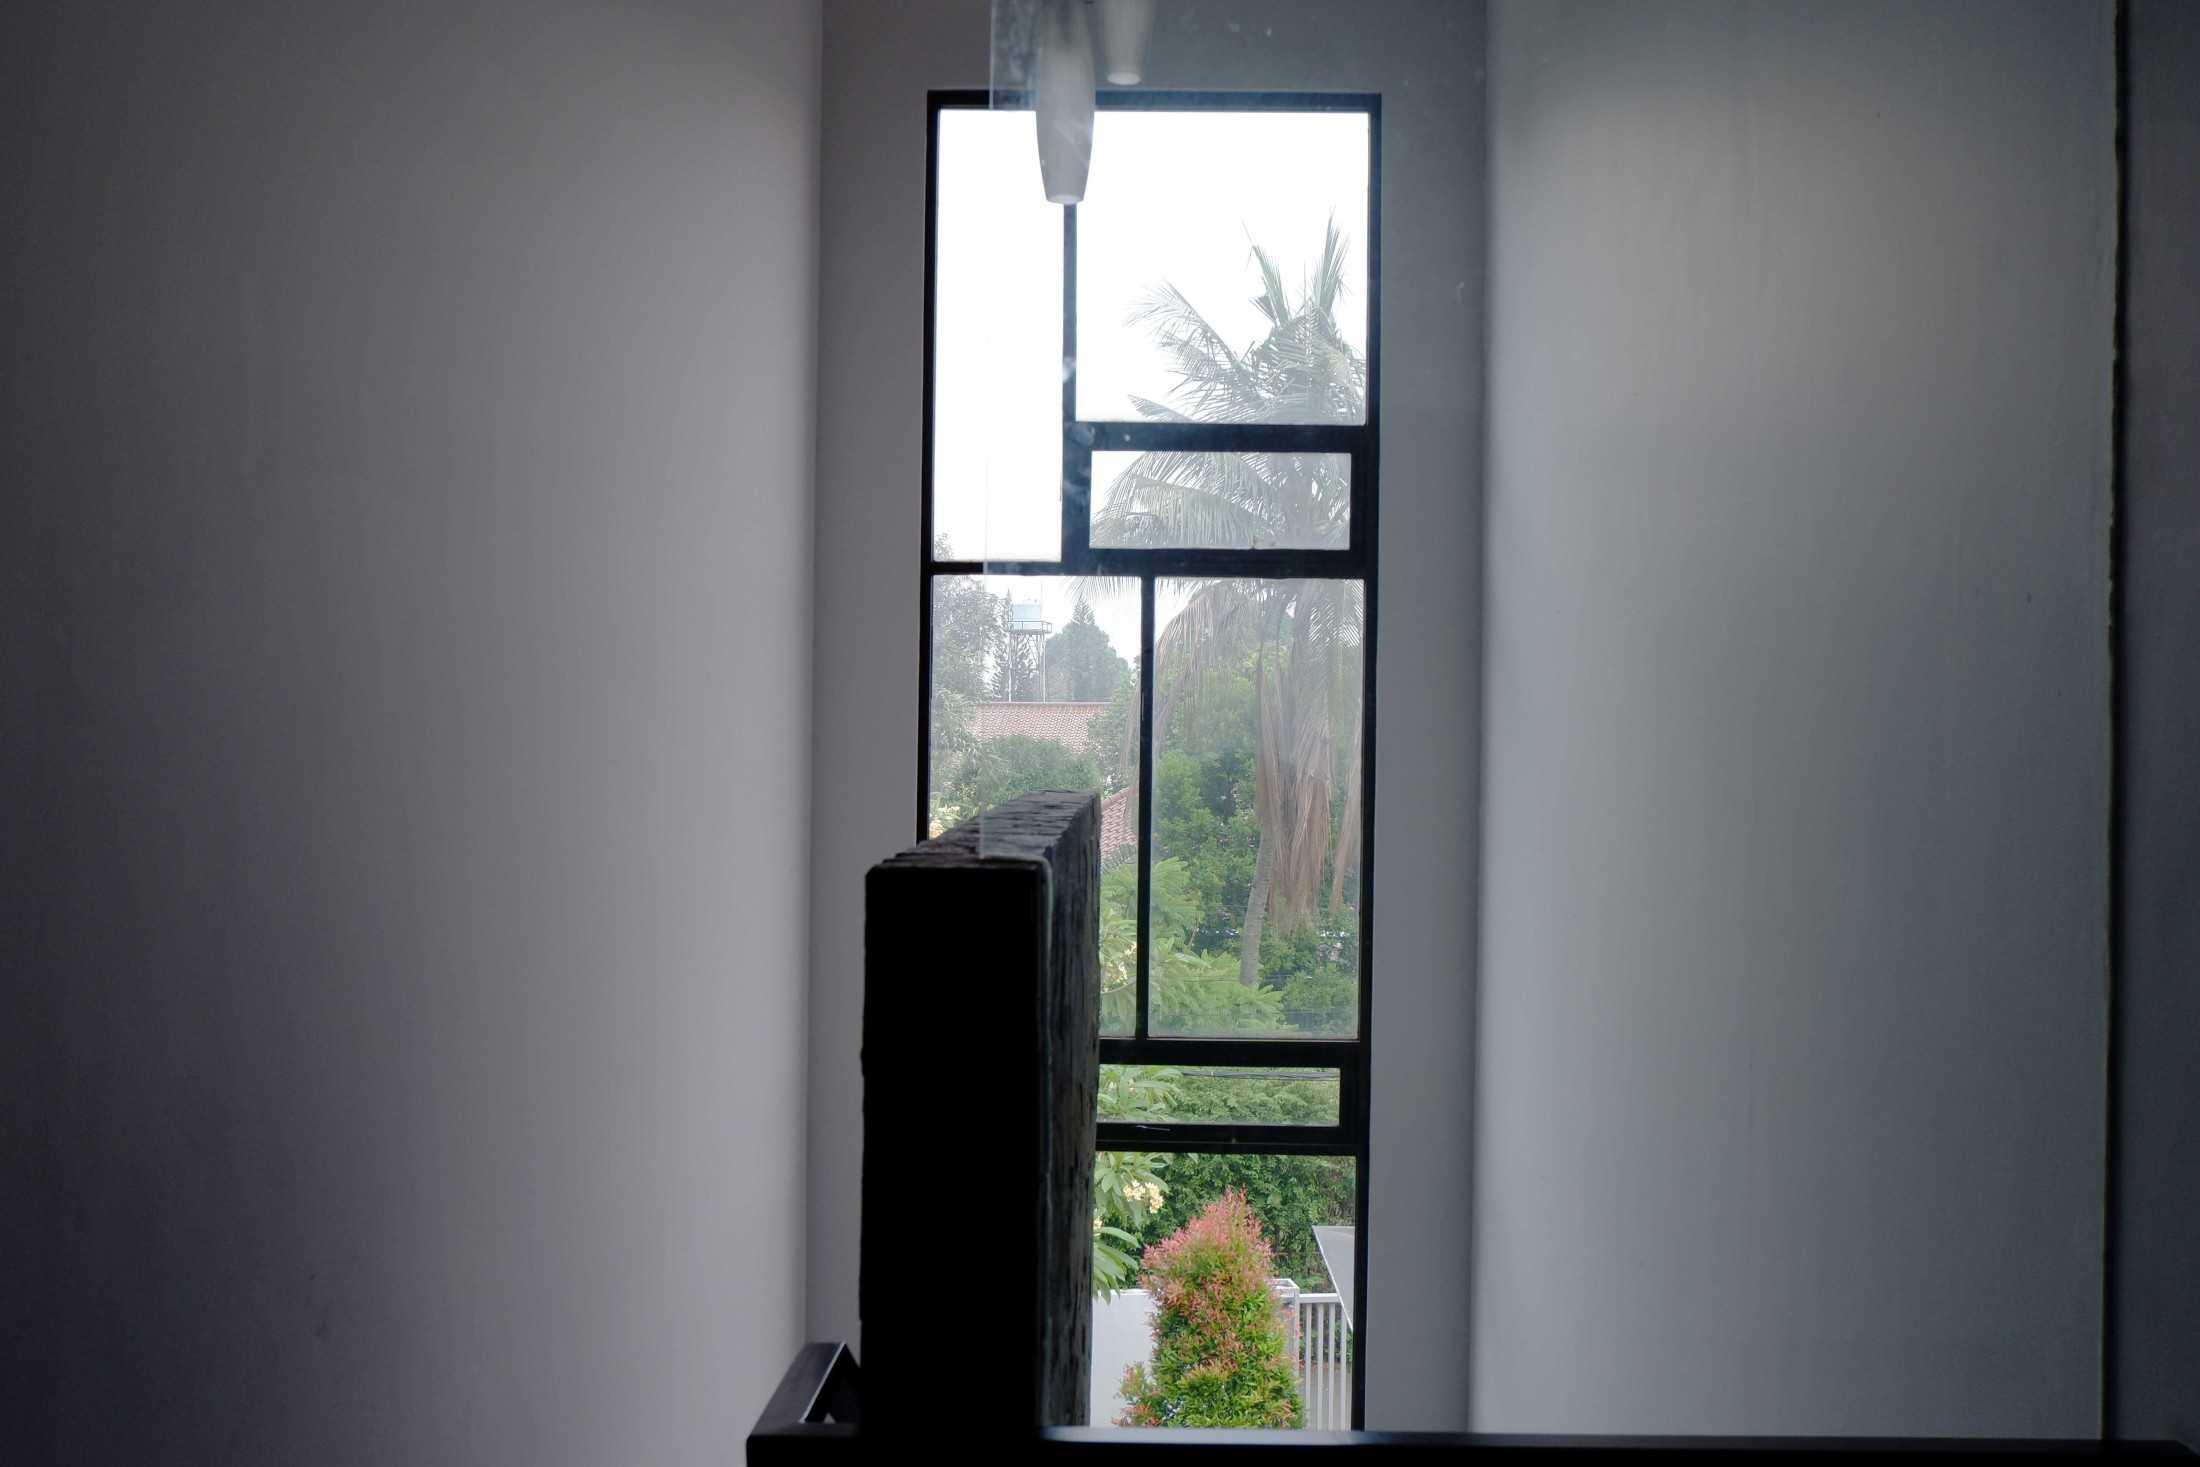 Lokative Studio Renovasi Rumah Cempaka Jakarta, Daerah Khusus Ibukota Jakarta, Indonesia Jakarta, Daerah Khusus Ibukota Jakarta, Indonesia Lokative-Studio-Renovasi-Rumah-Cempaka  97455